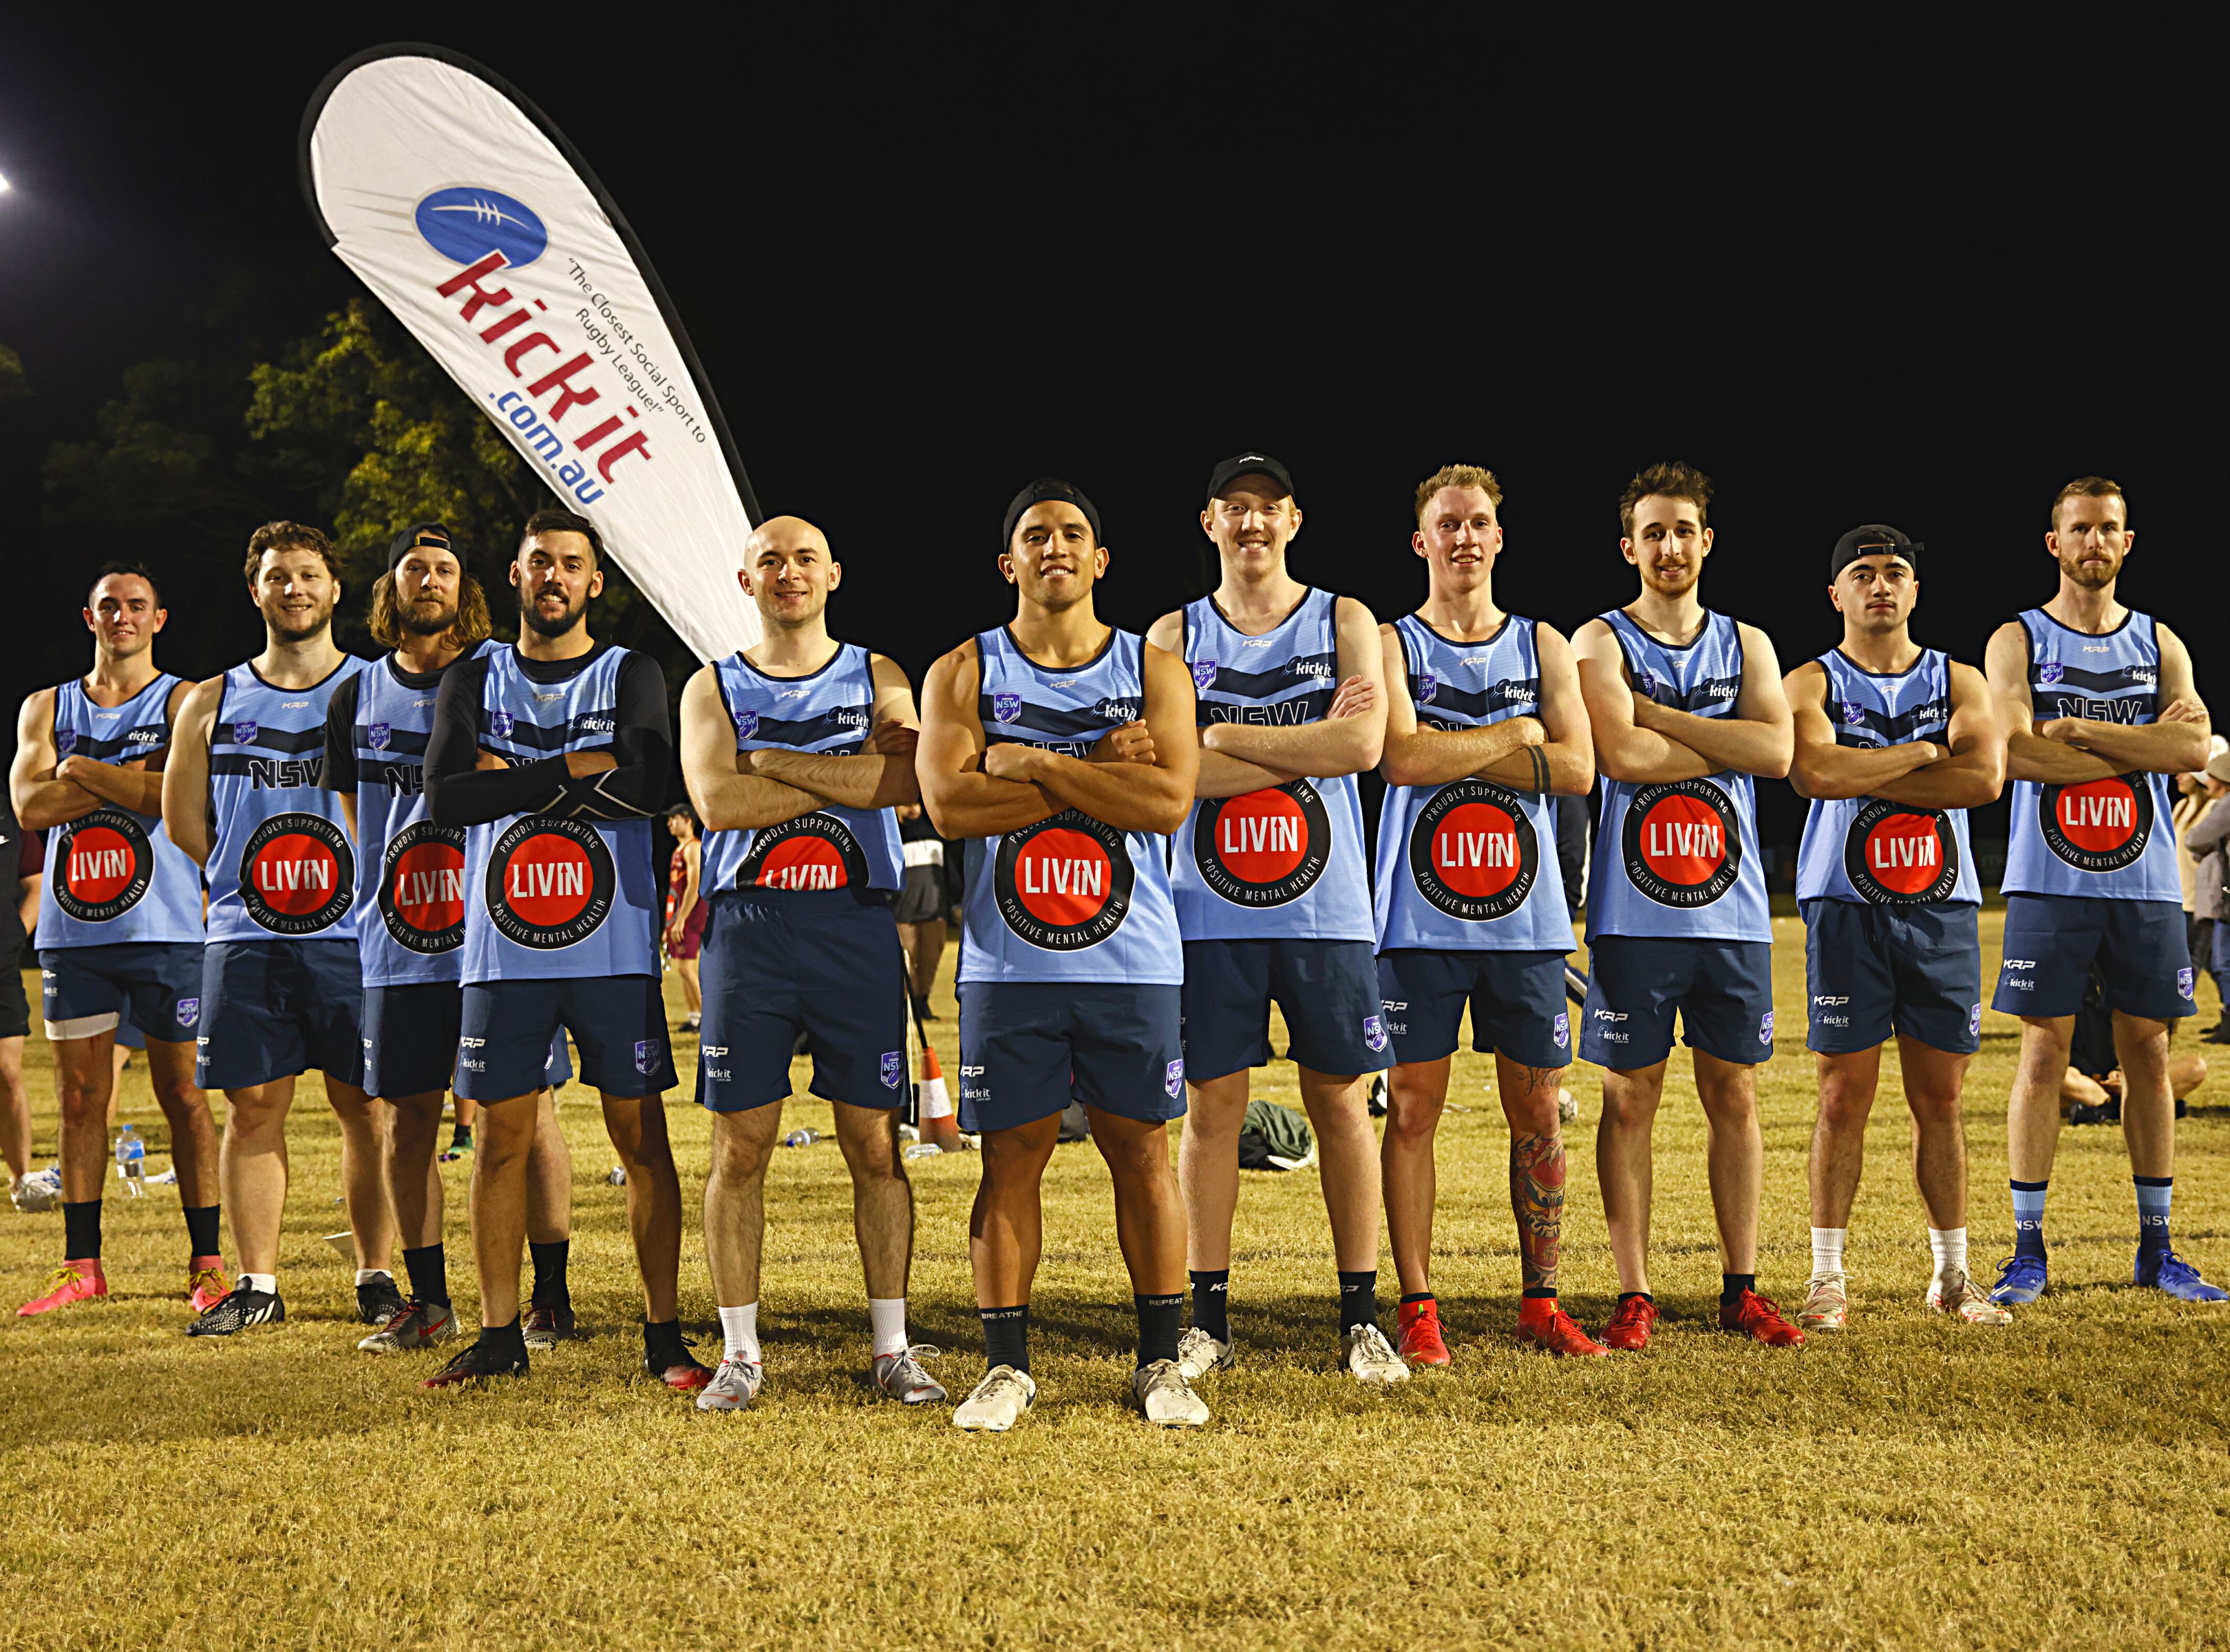 NSW Mixed, QLD Mens Lift 2021 Origin Shield